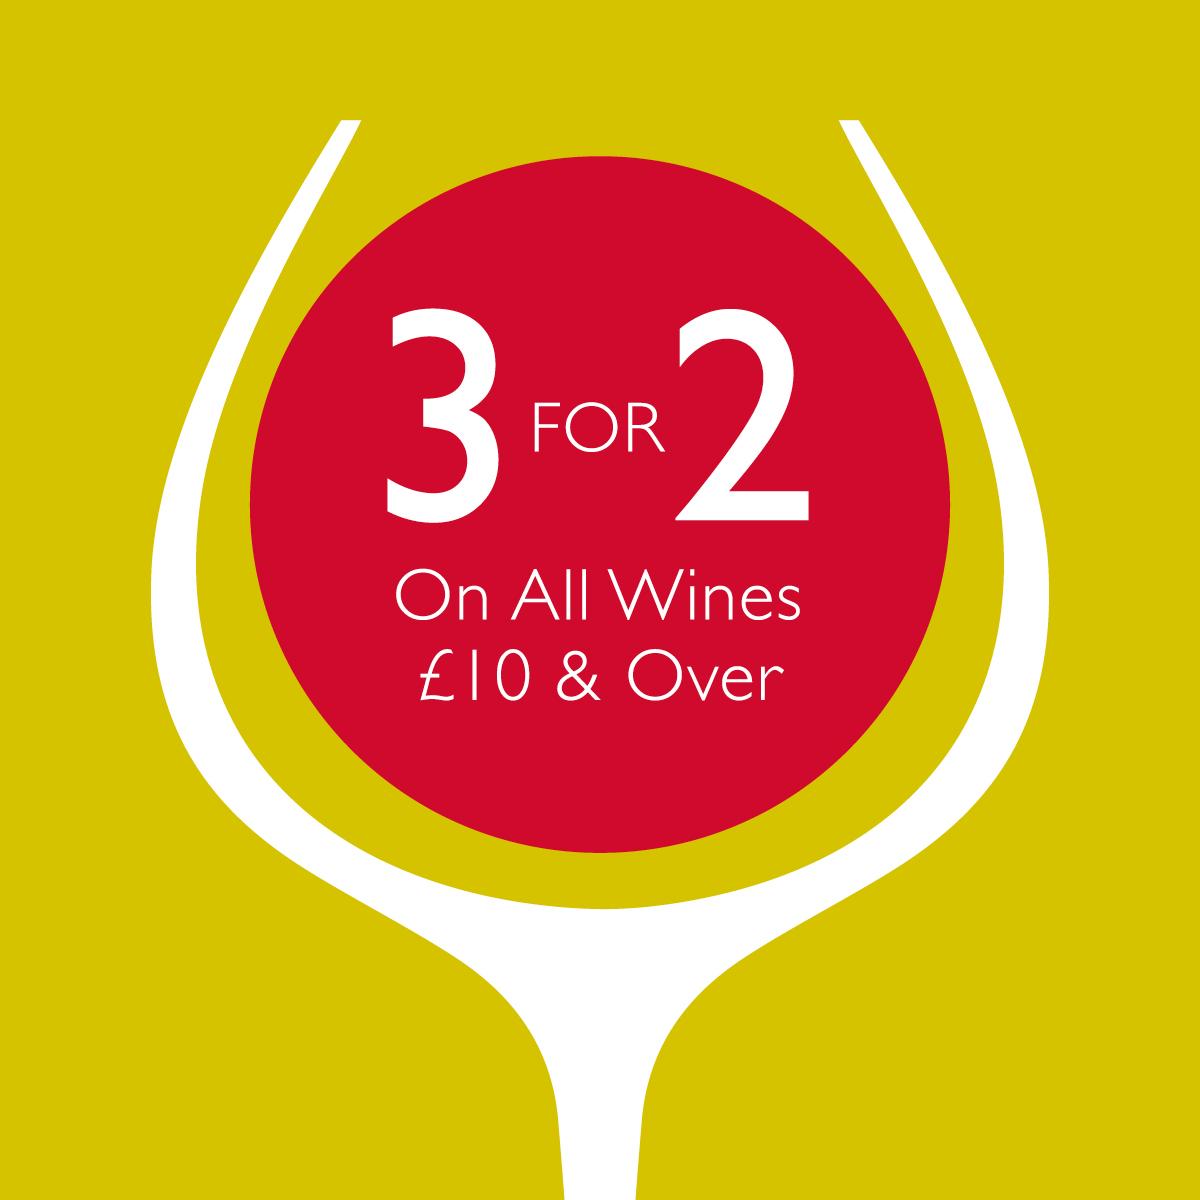 Enjoy 3 for 2 on Wine